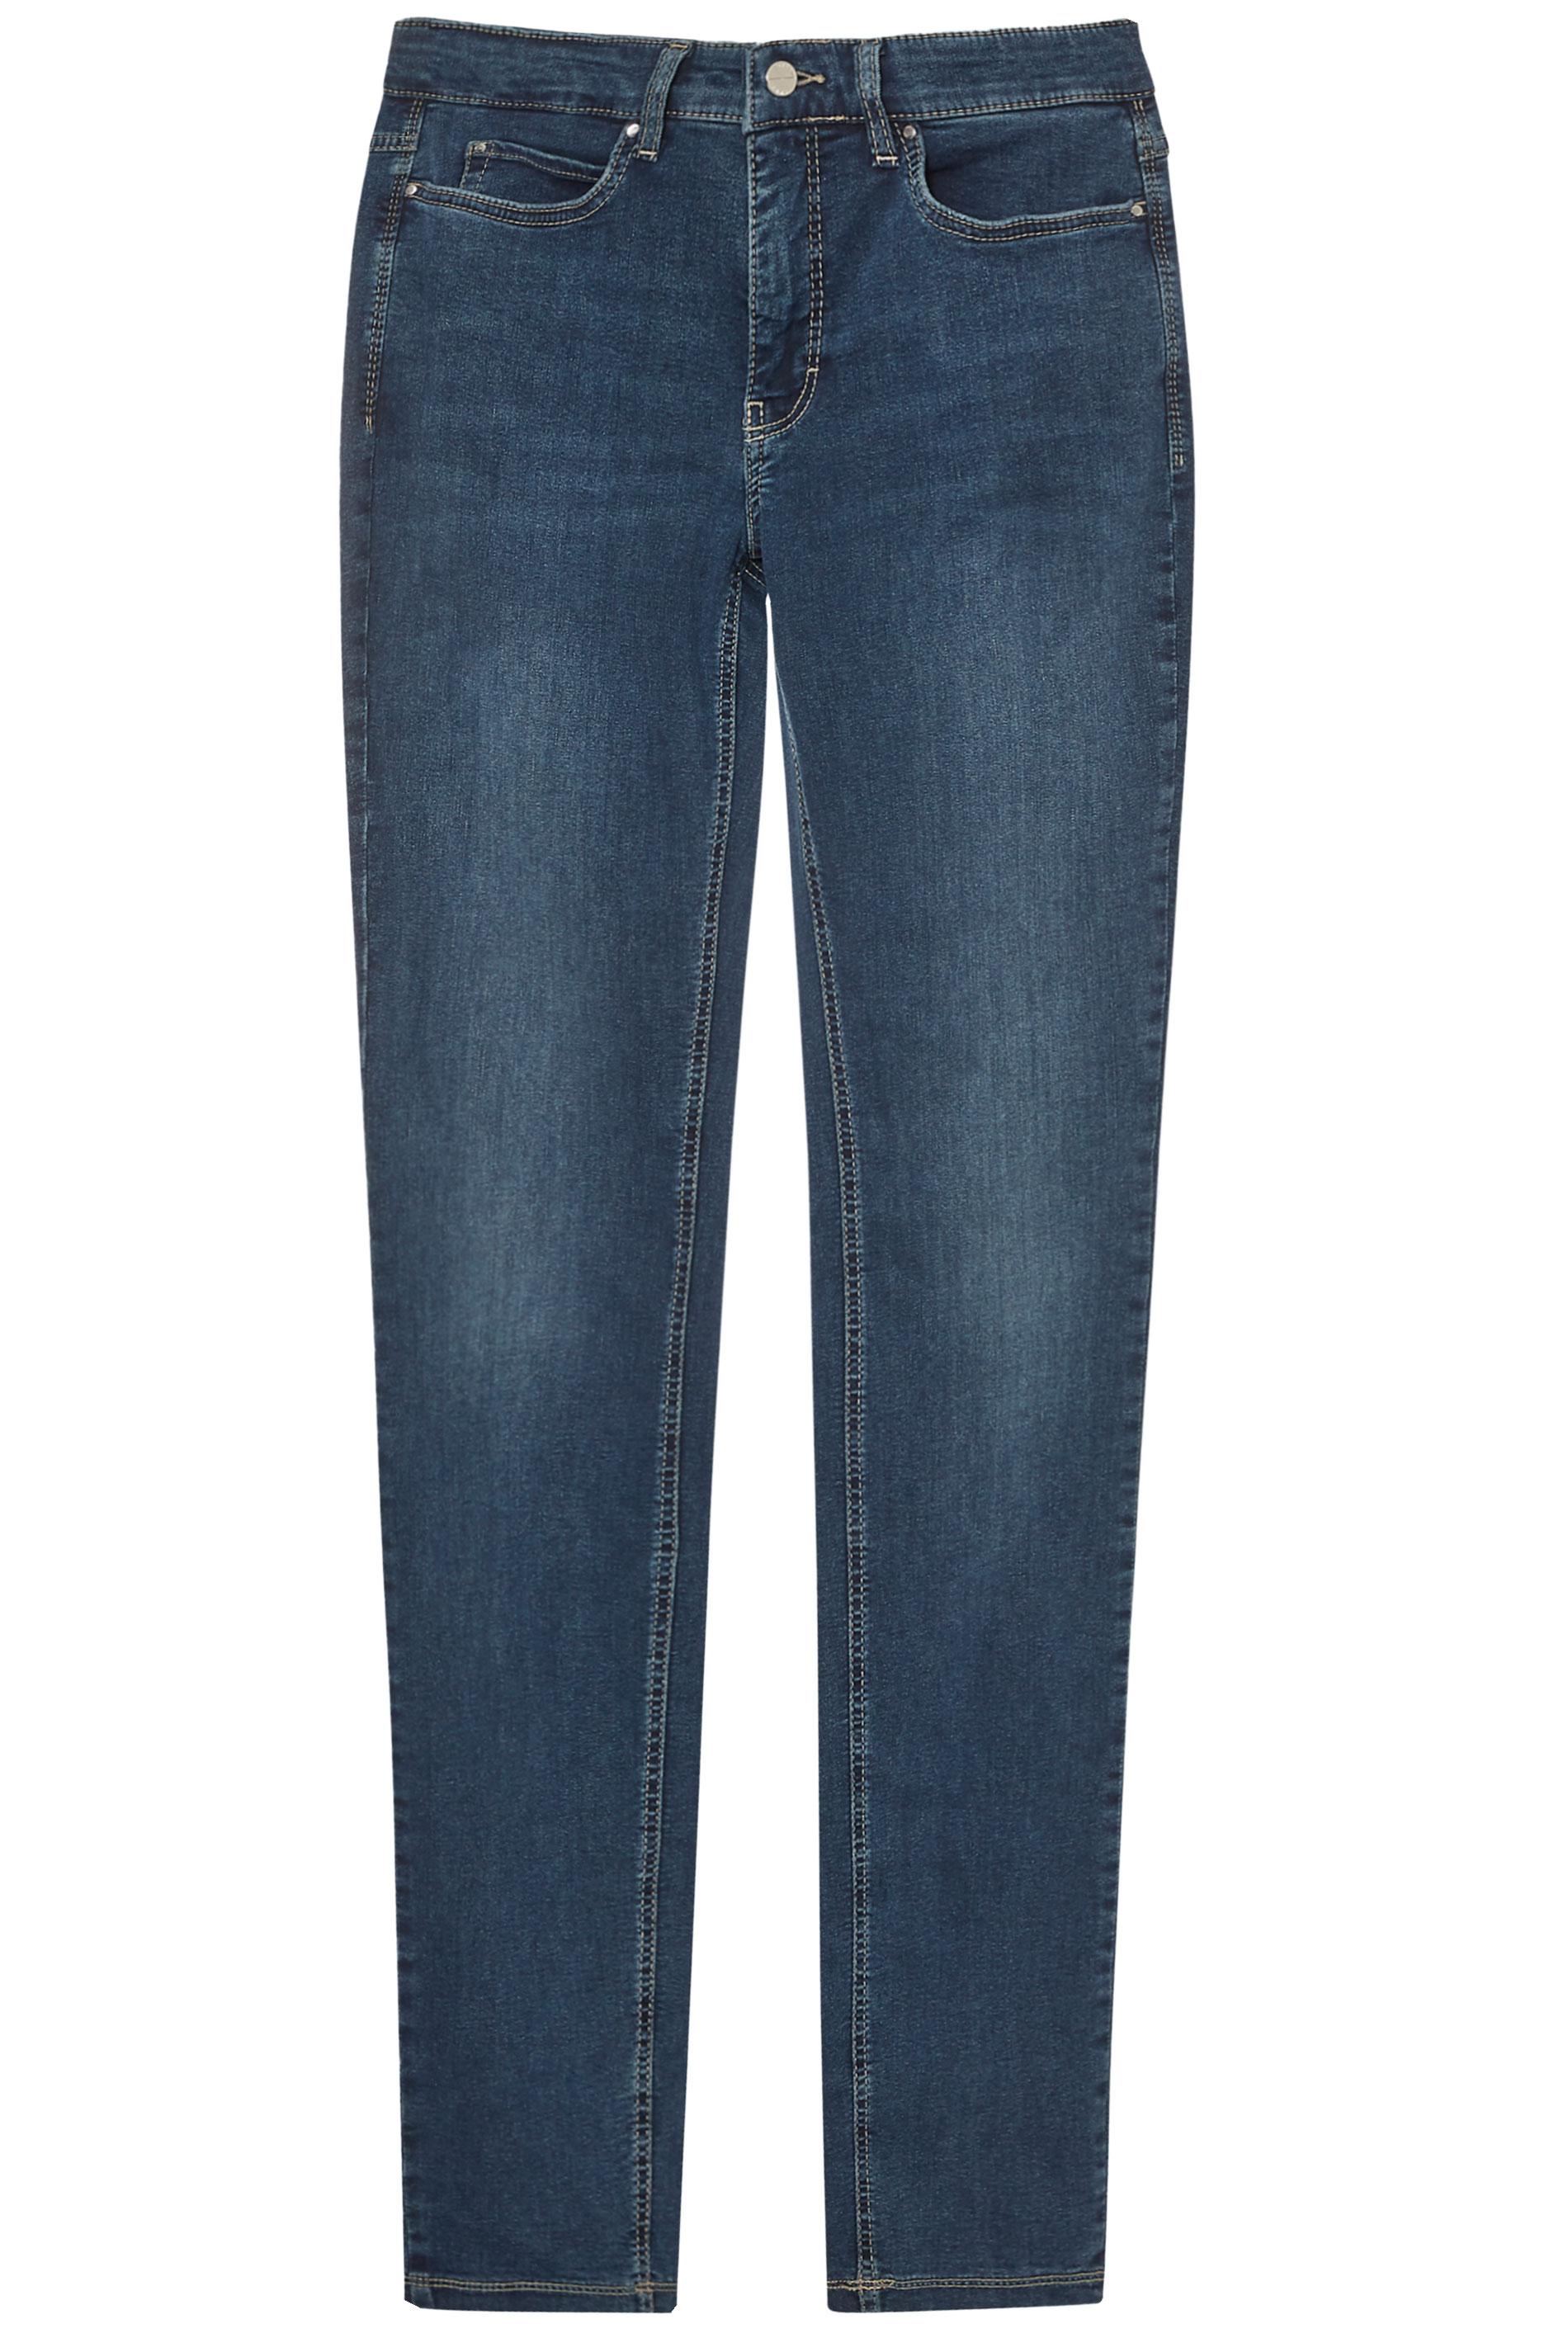 MAC Dark Blue Skinny Dream Jean